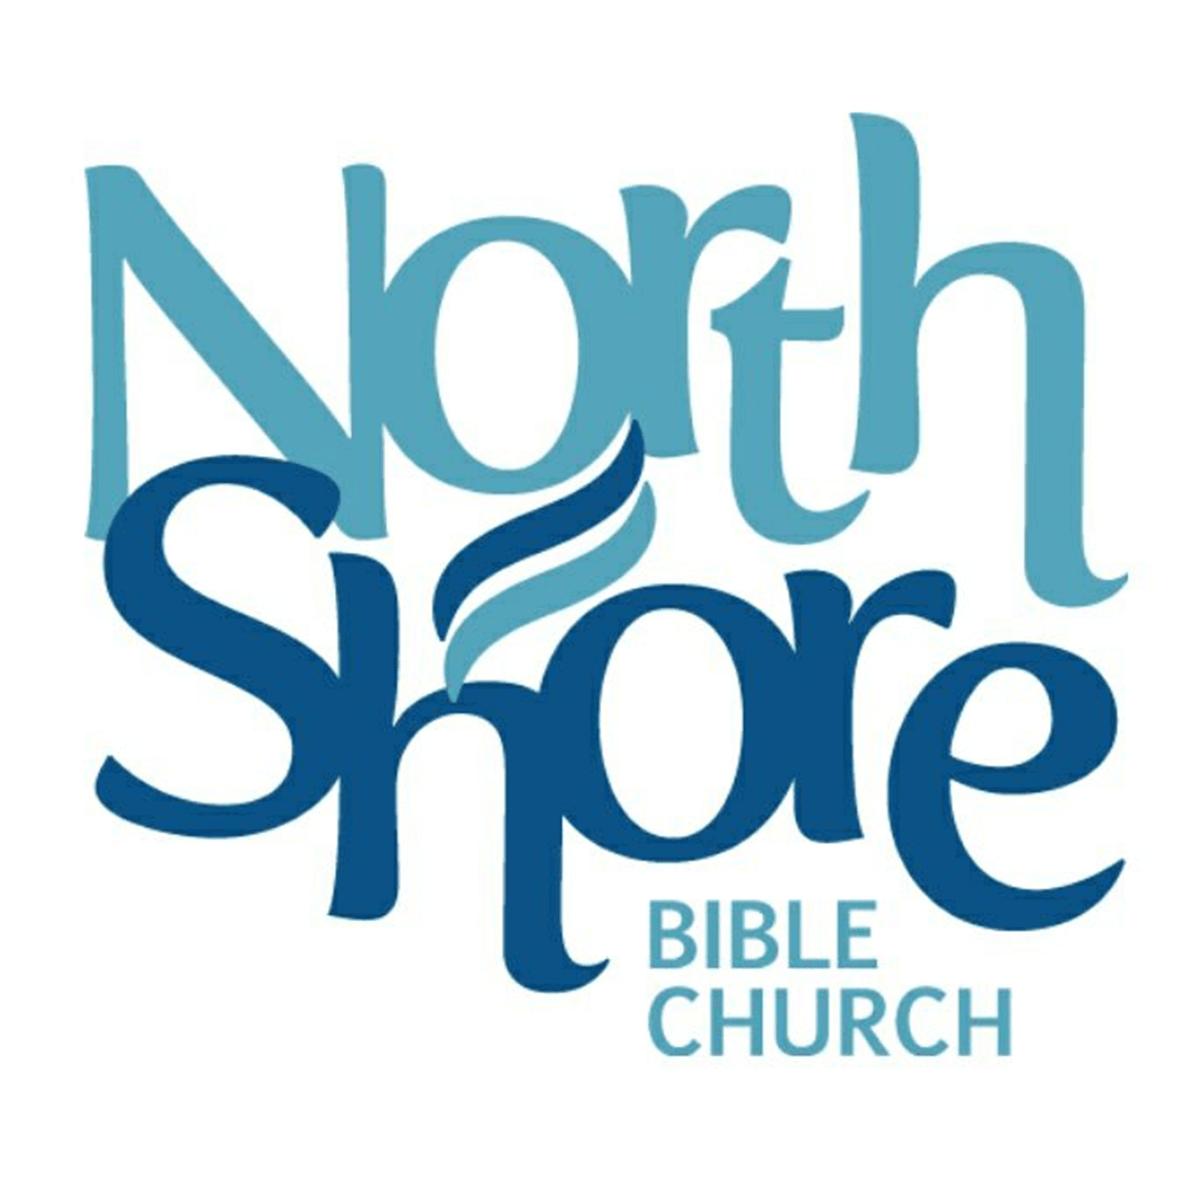 North Shore Bible Church logo